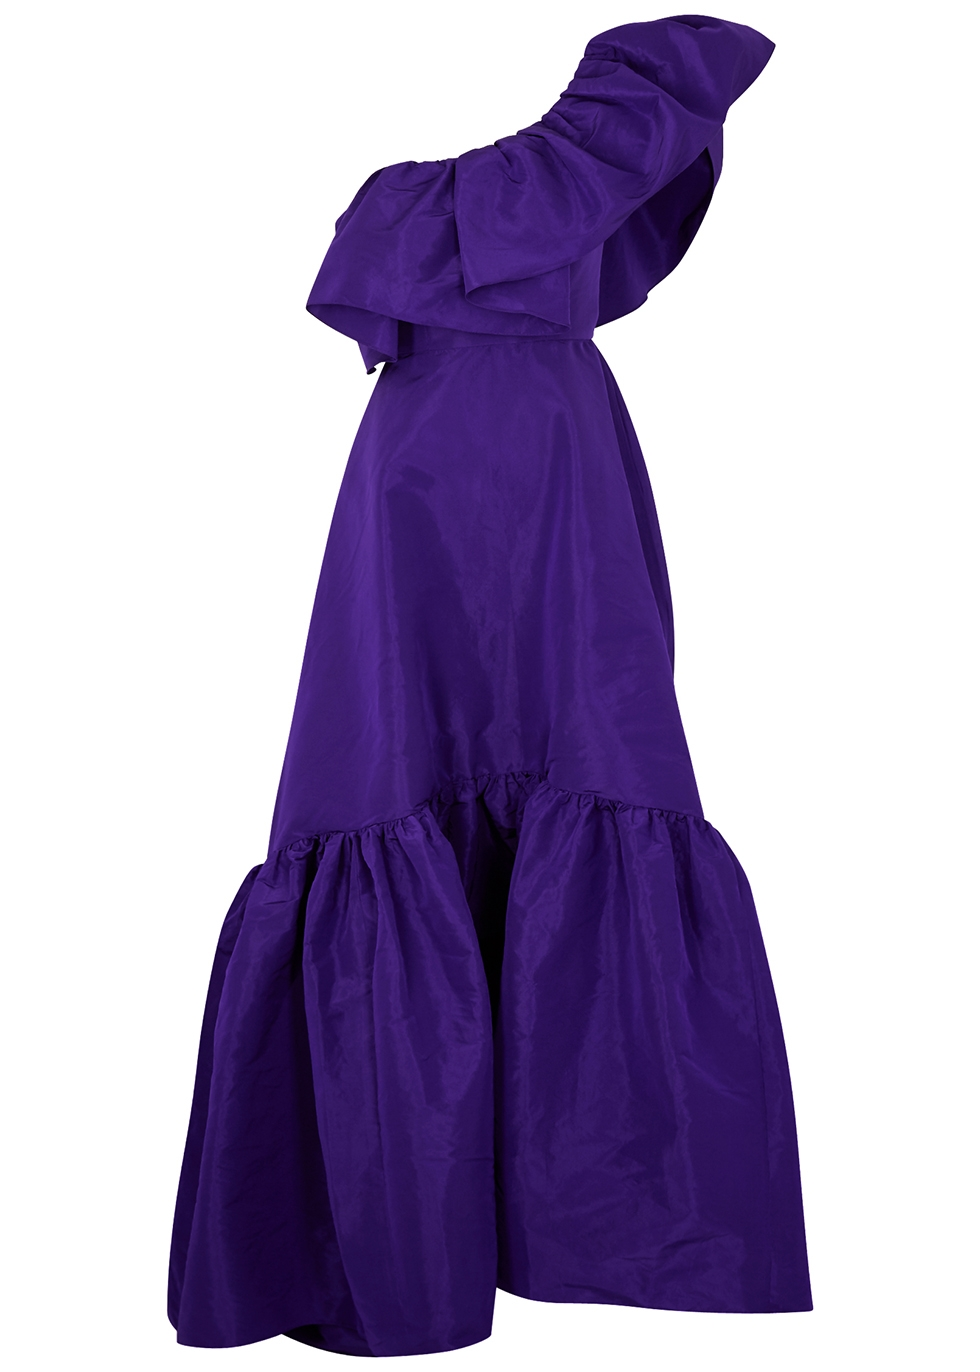 Purple one-shoulder taffeta gown